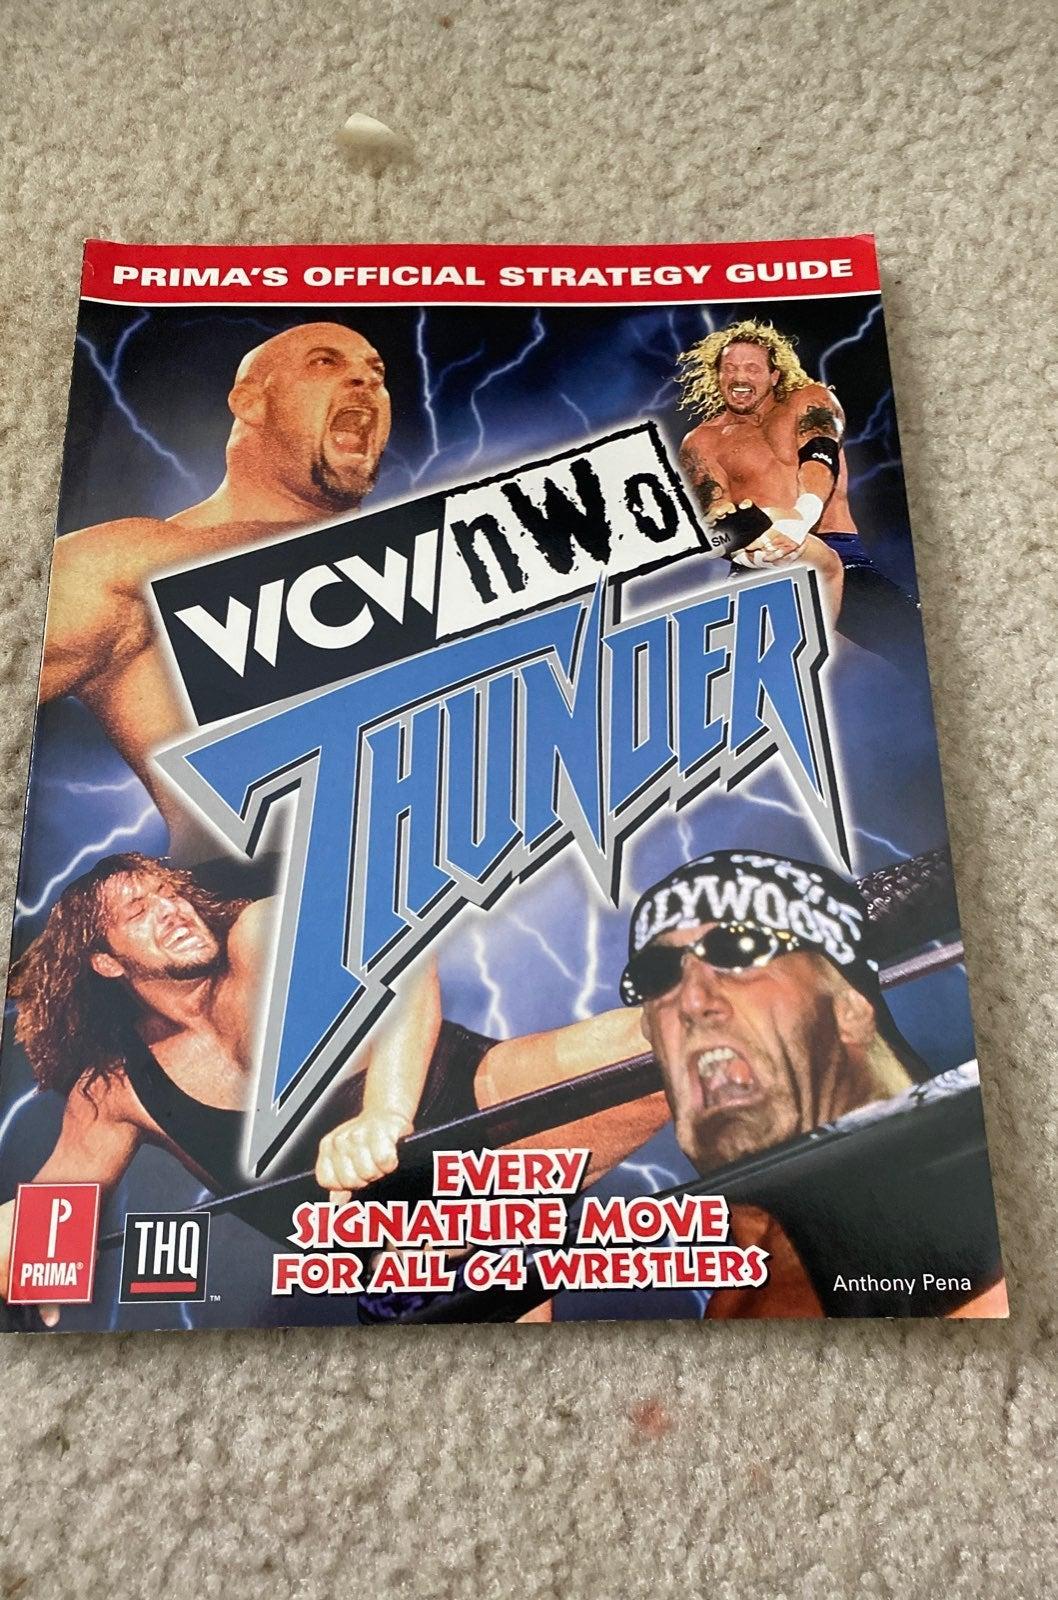 WCWNWO THUNDER Strat Guide